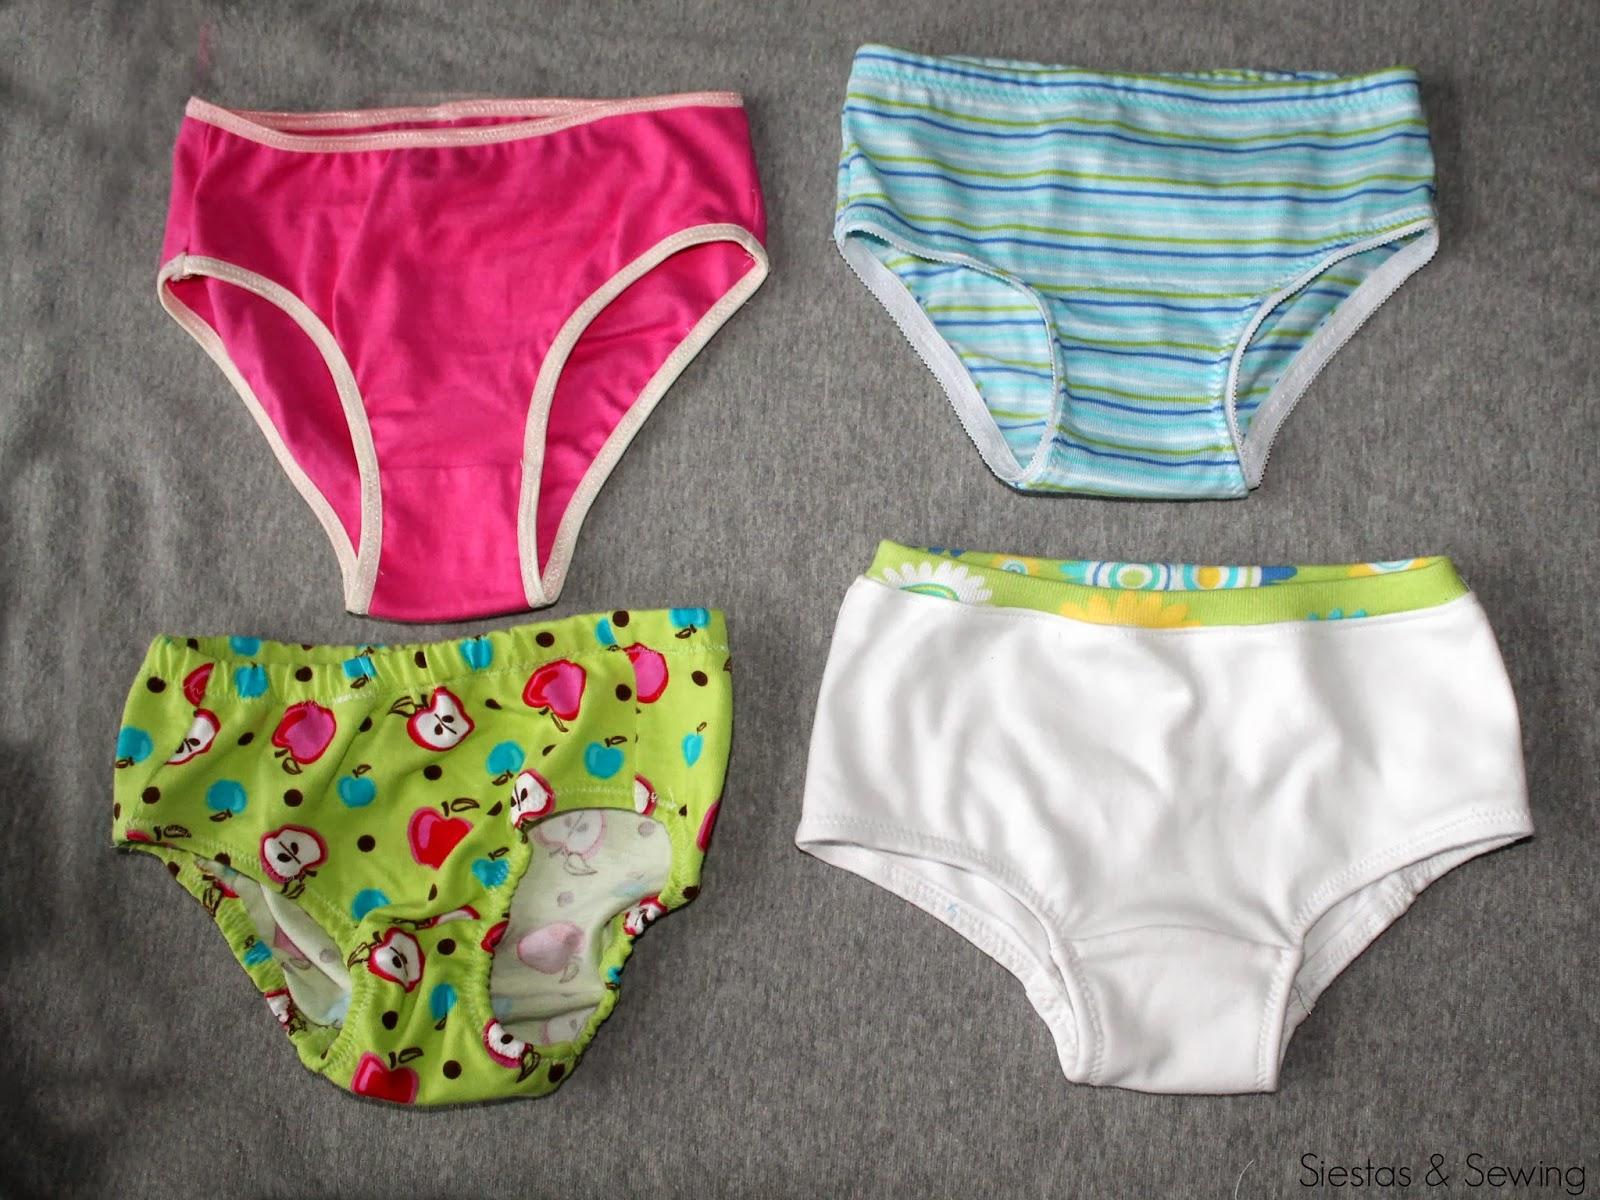 Girls used panties pics